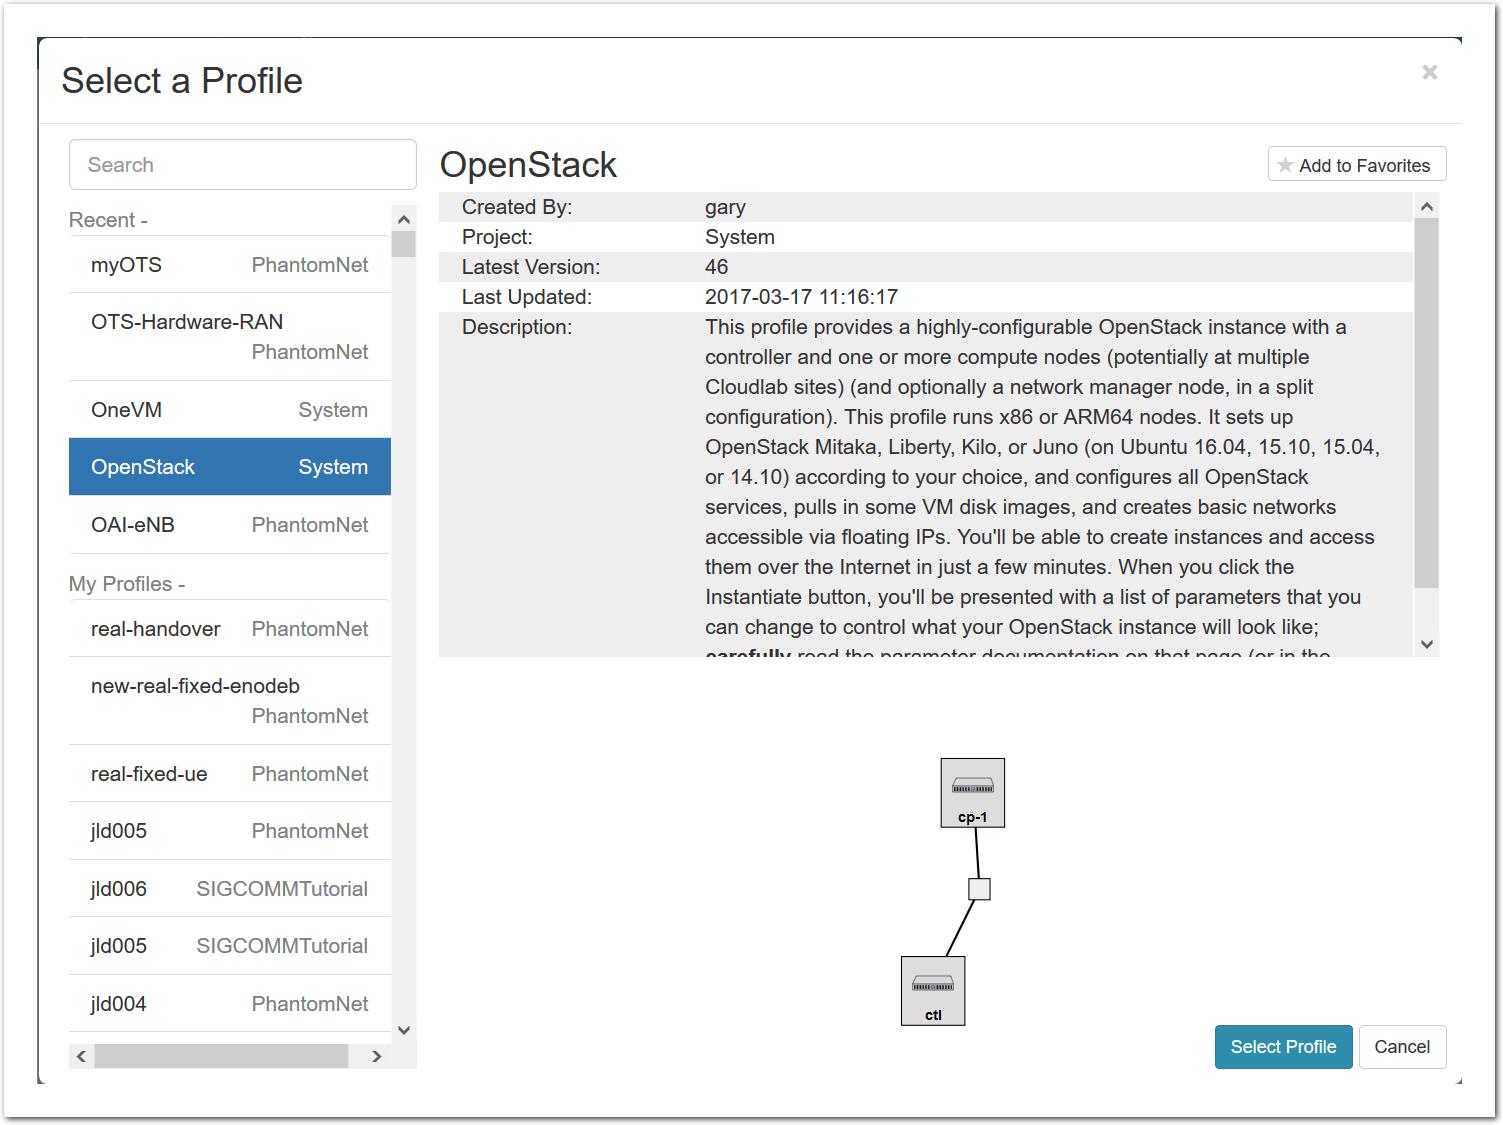 screenshots/apt/select-profile.png